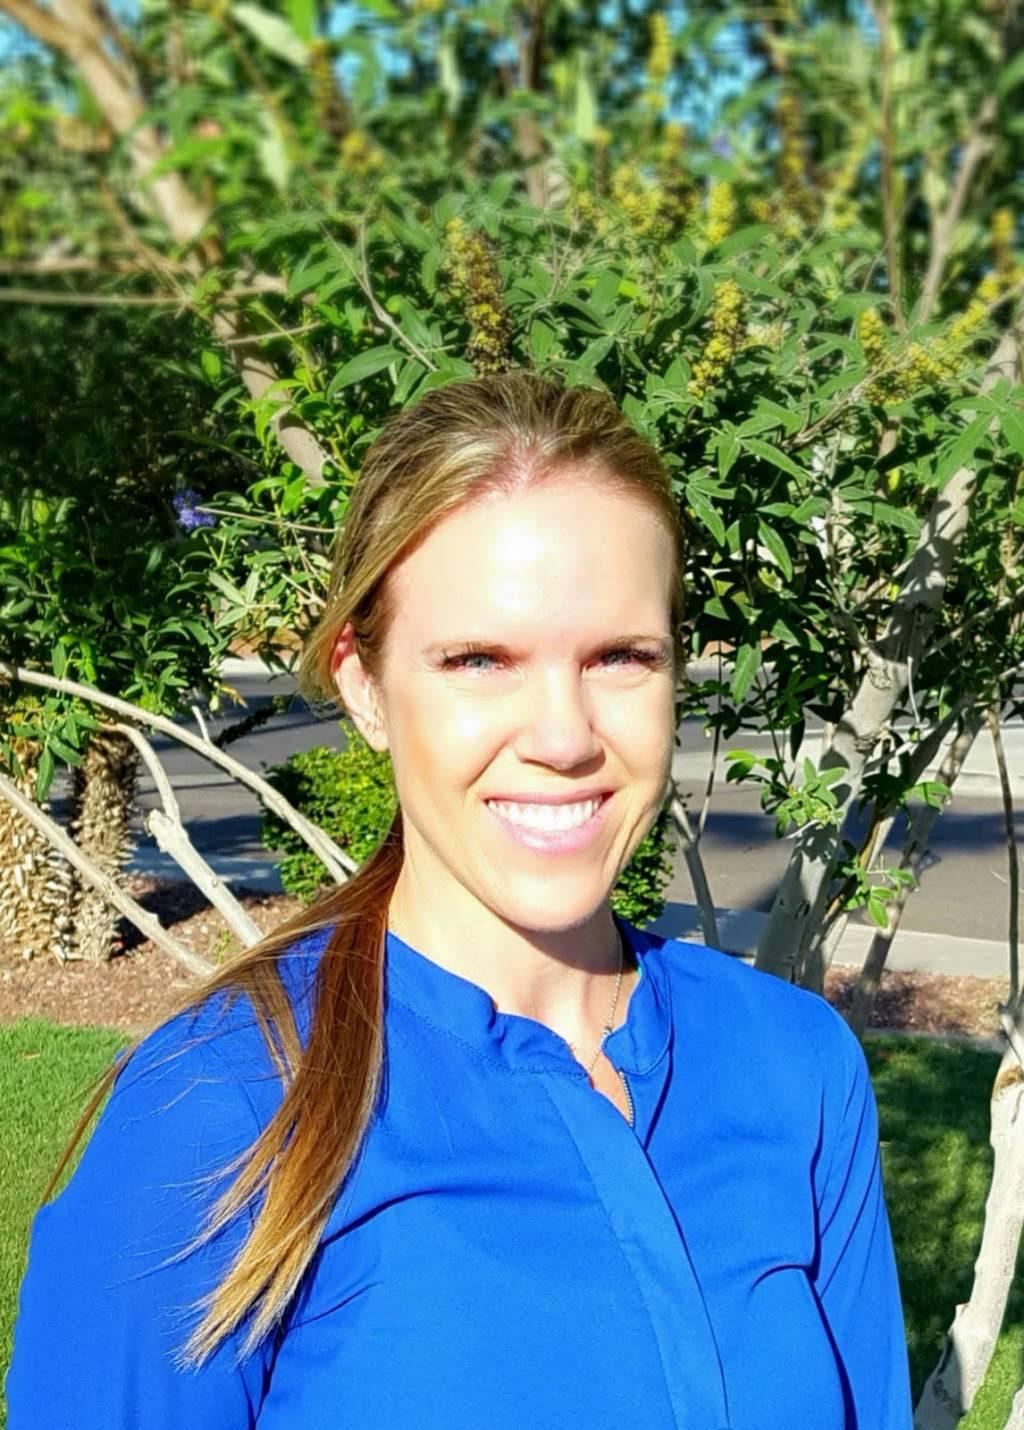 Thrive Pelvic Health & Wellness - physiotherapist  | Photo 1 of 7 | Address: 15833 S 38th St, Phoenix, AZ 85048, USA | Phone: (602) 791-9298